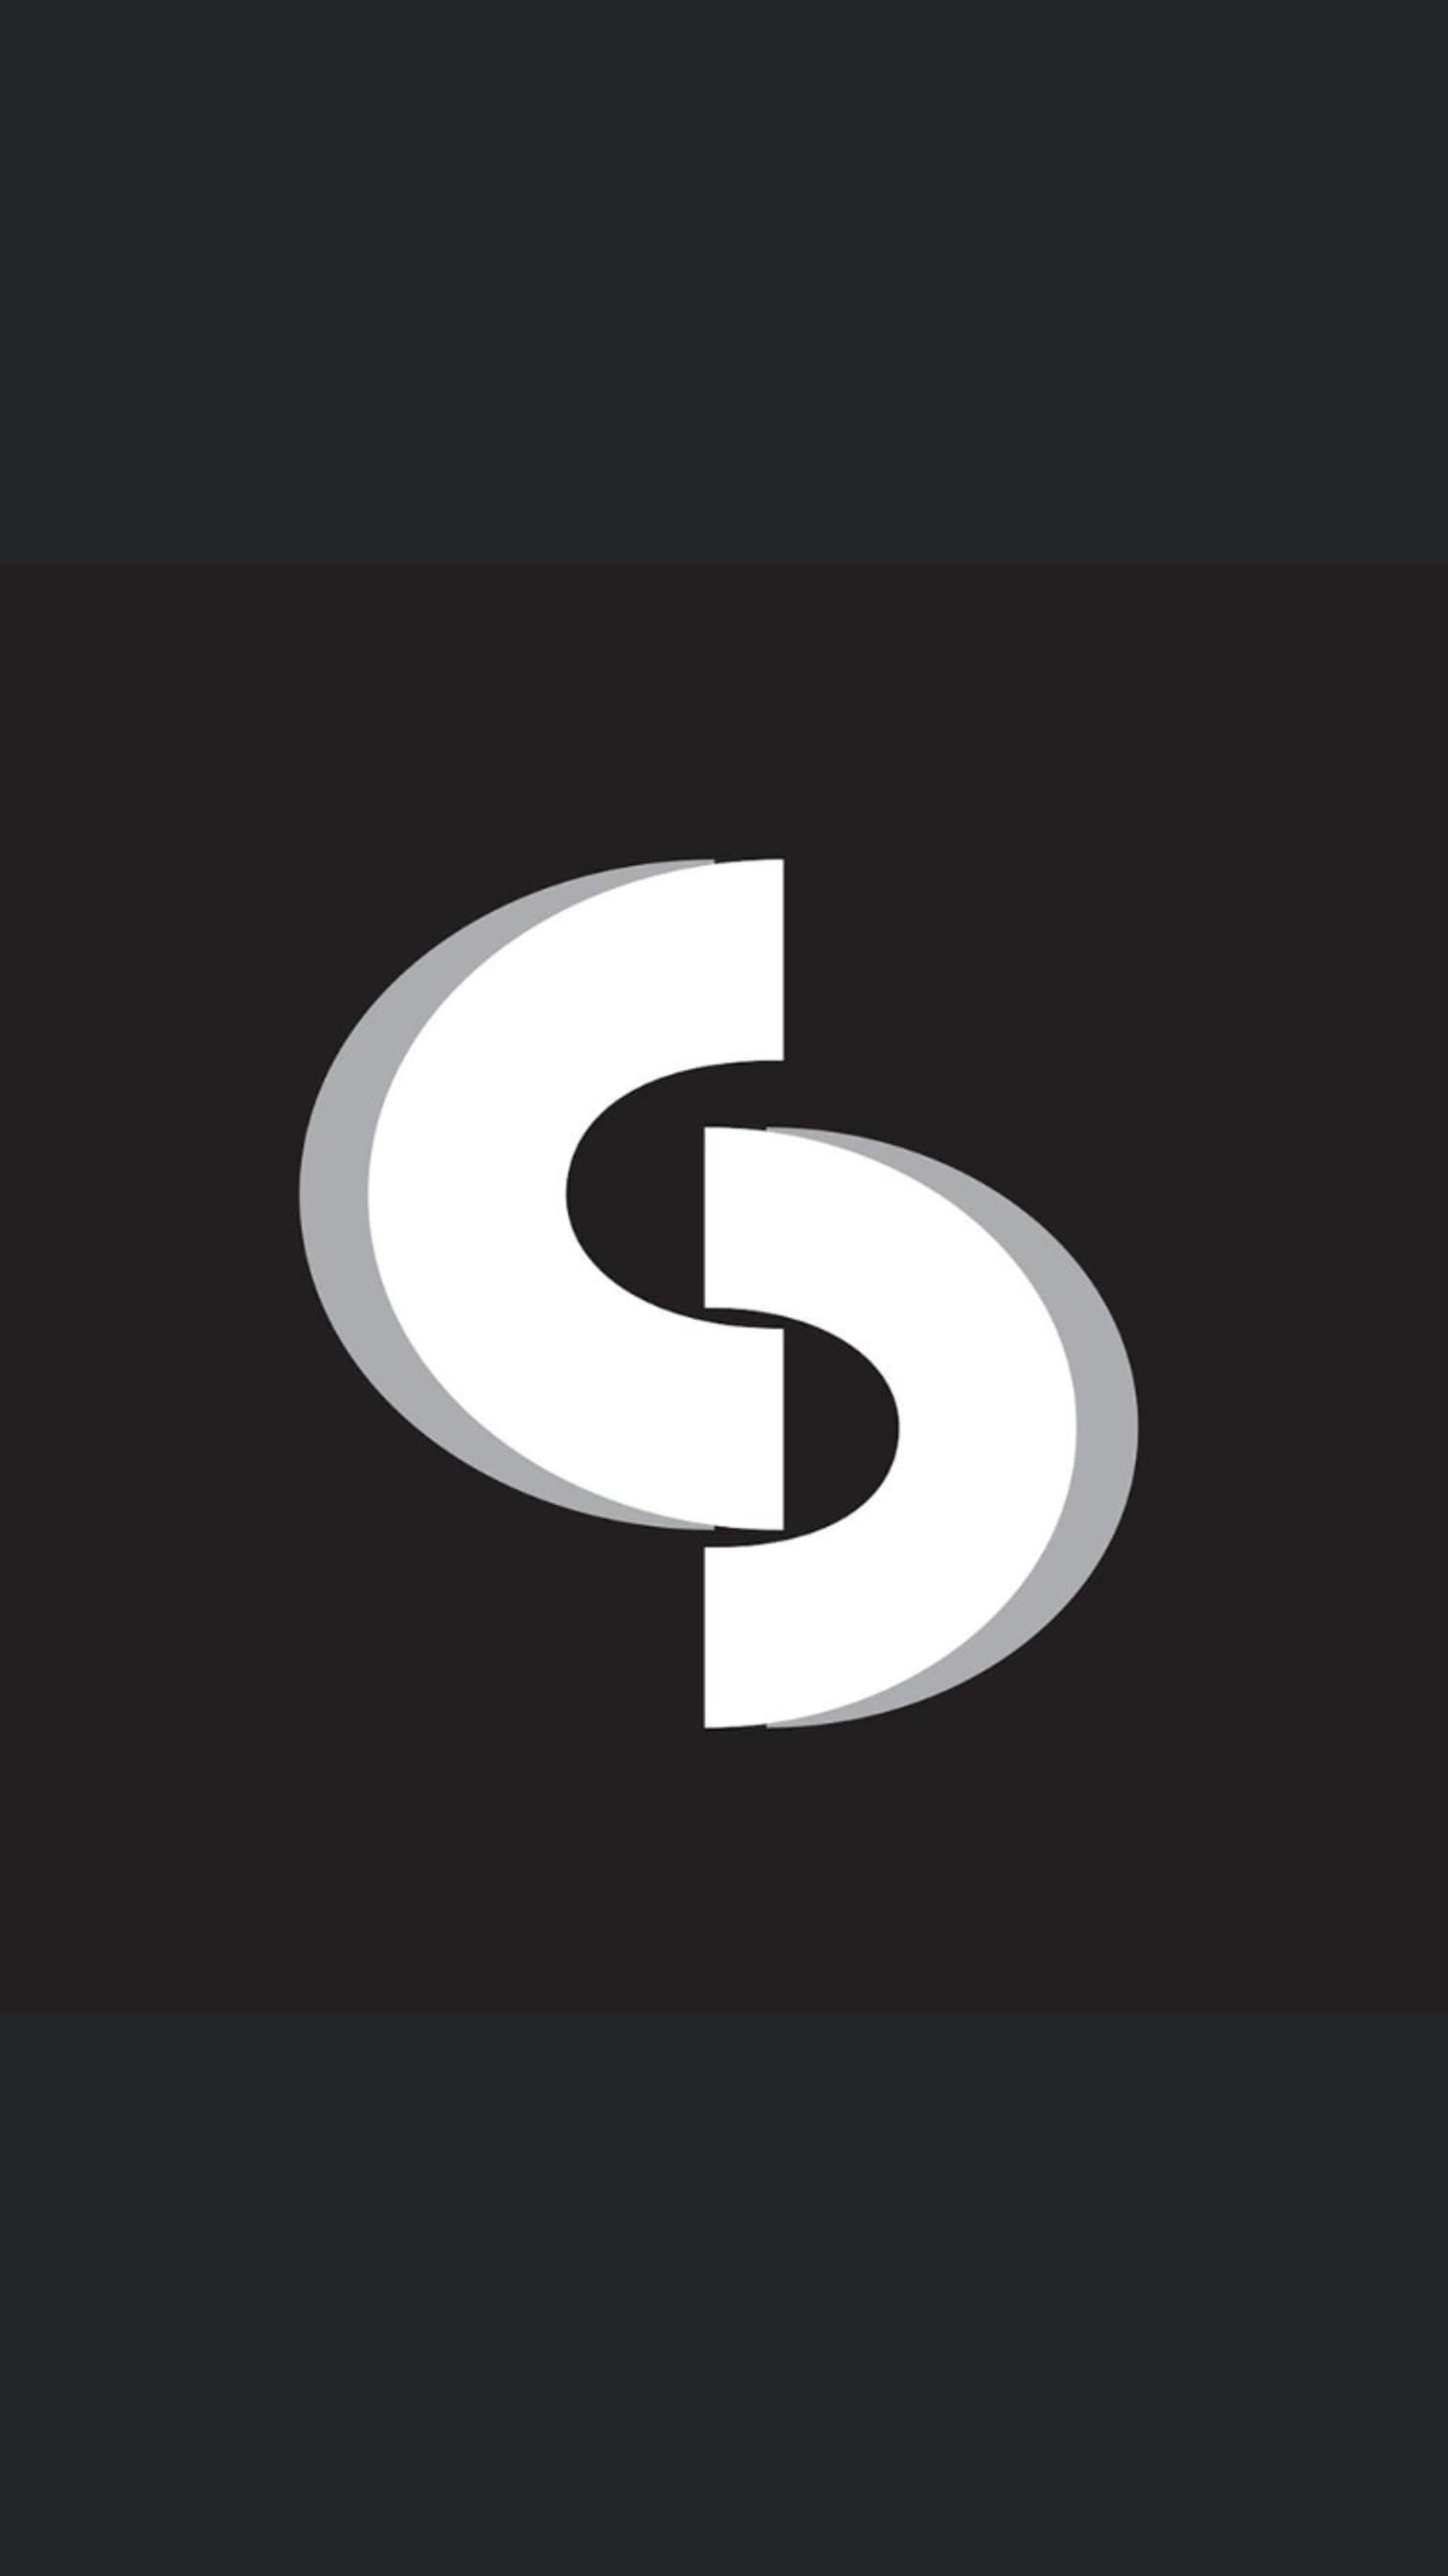 logo Coeman Decoratie